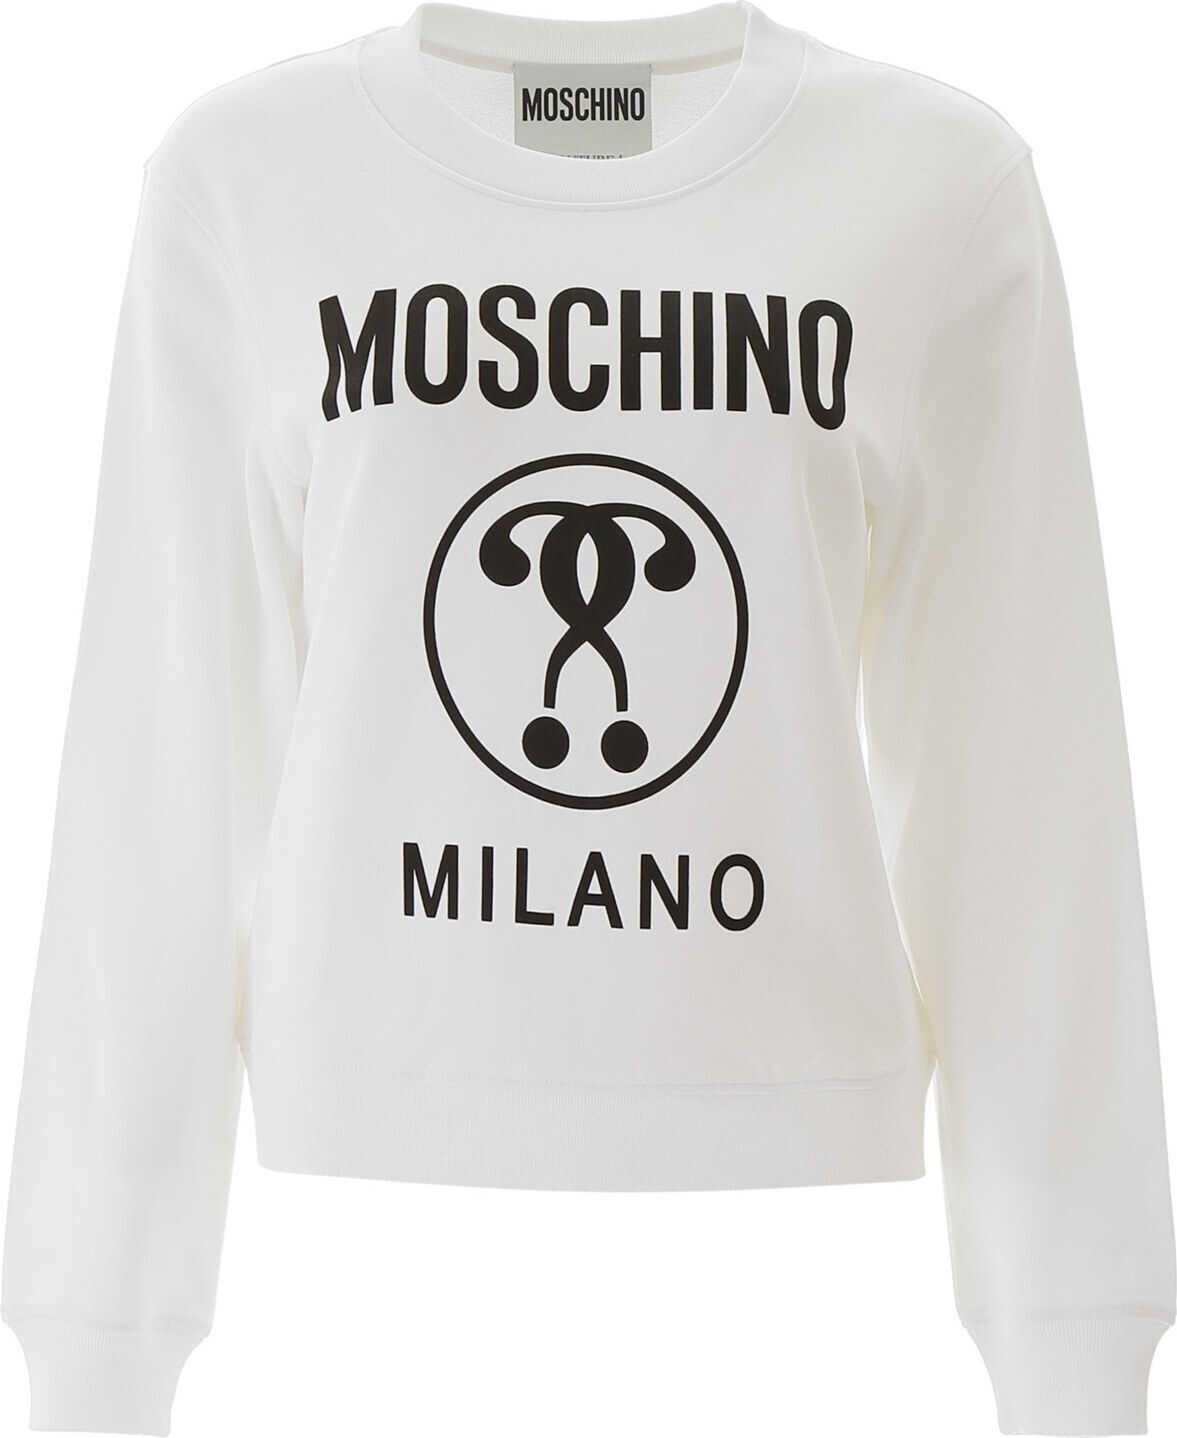 Moschino A1719 527 FANTASIA BIANCO